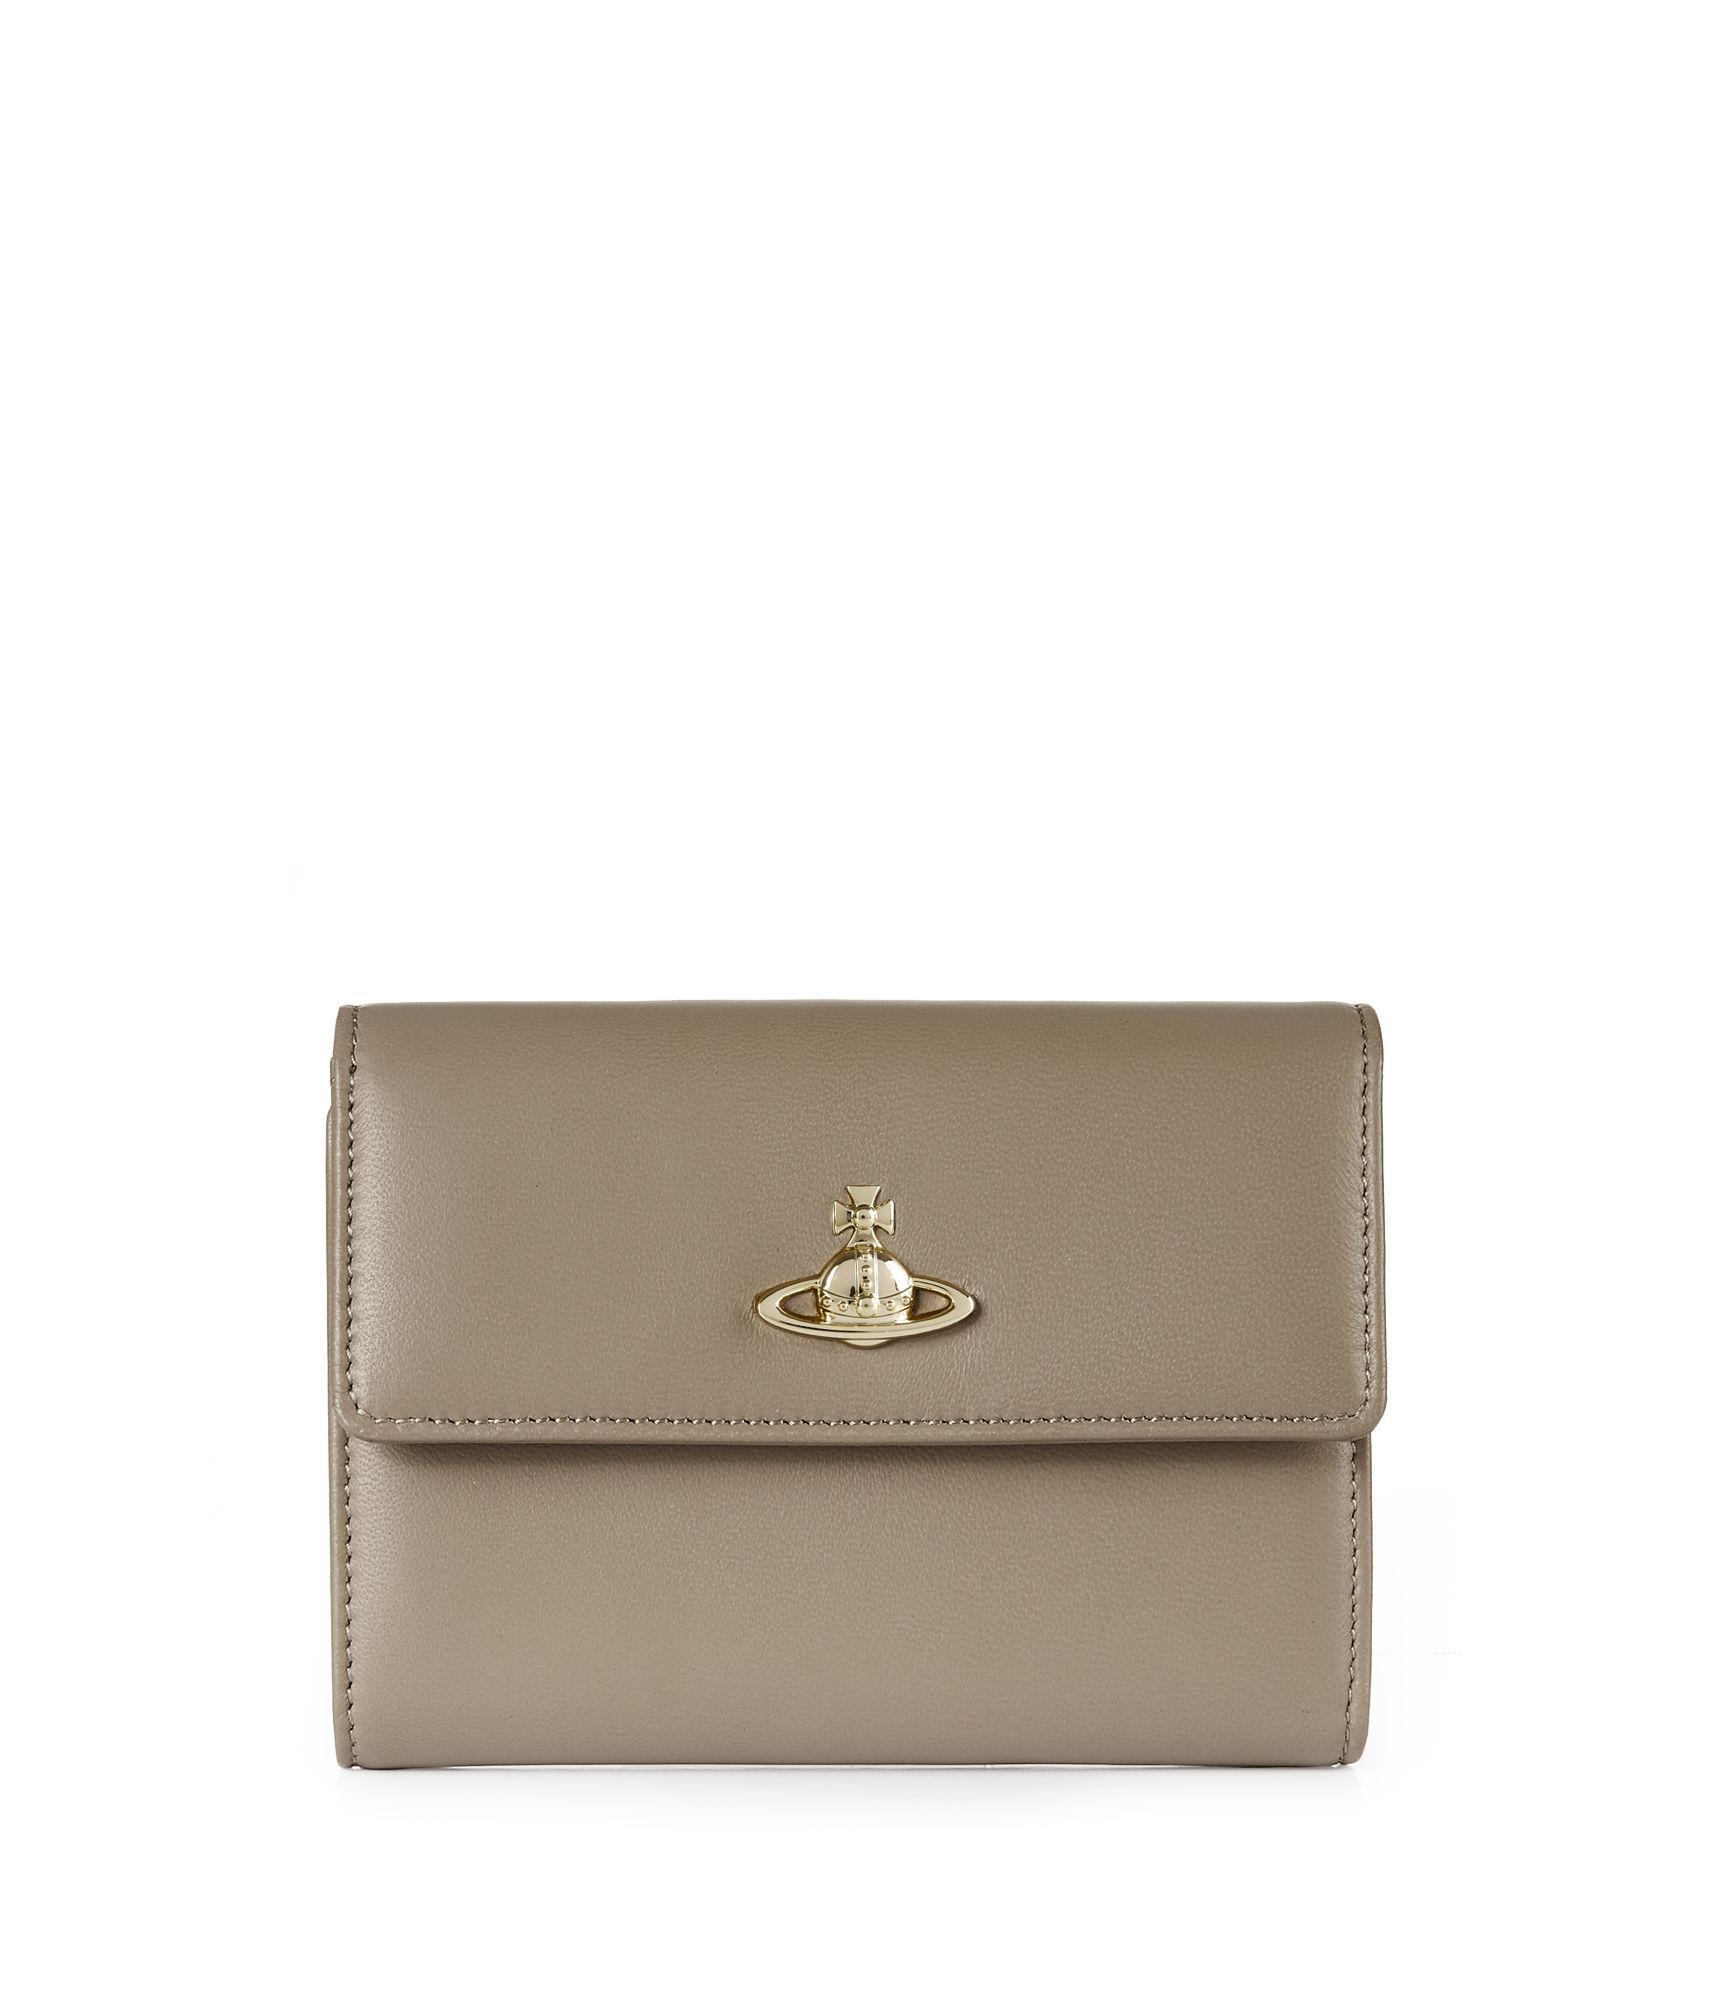 3786d18153 Vivienne Westwood Nappa Medium Wallet 51070002 Nutmeg | ModeSens